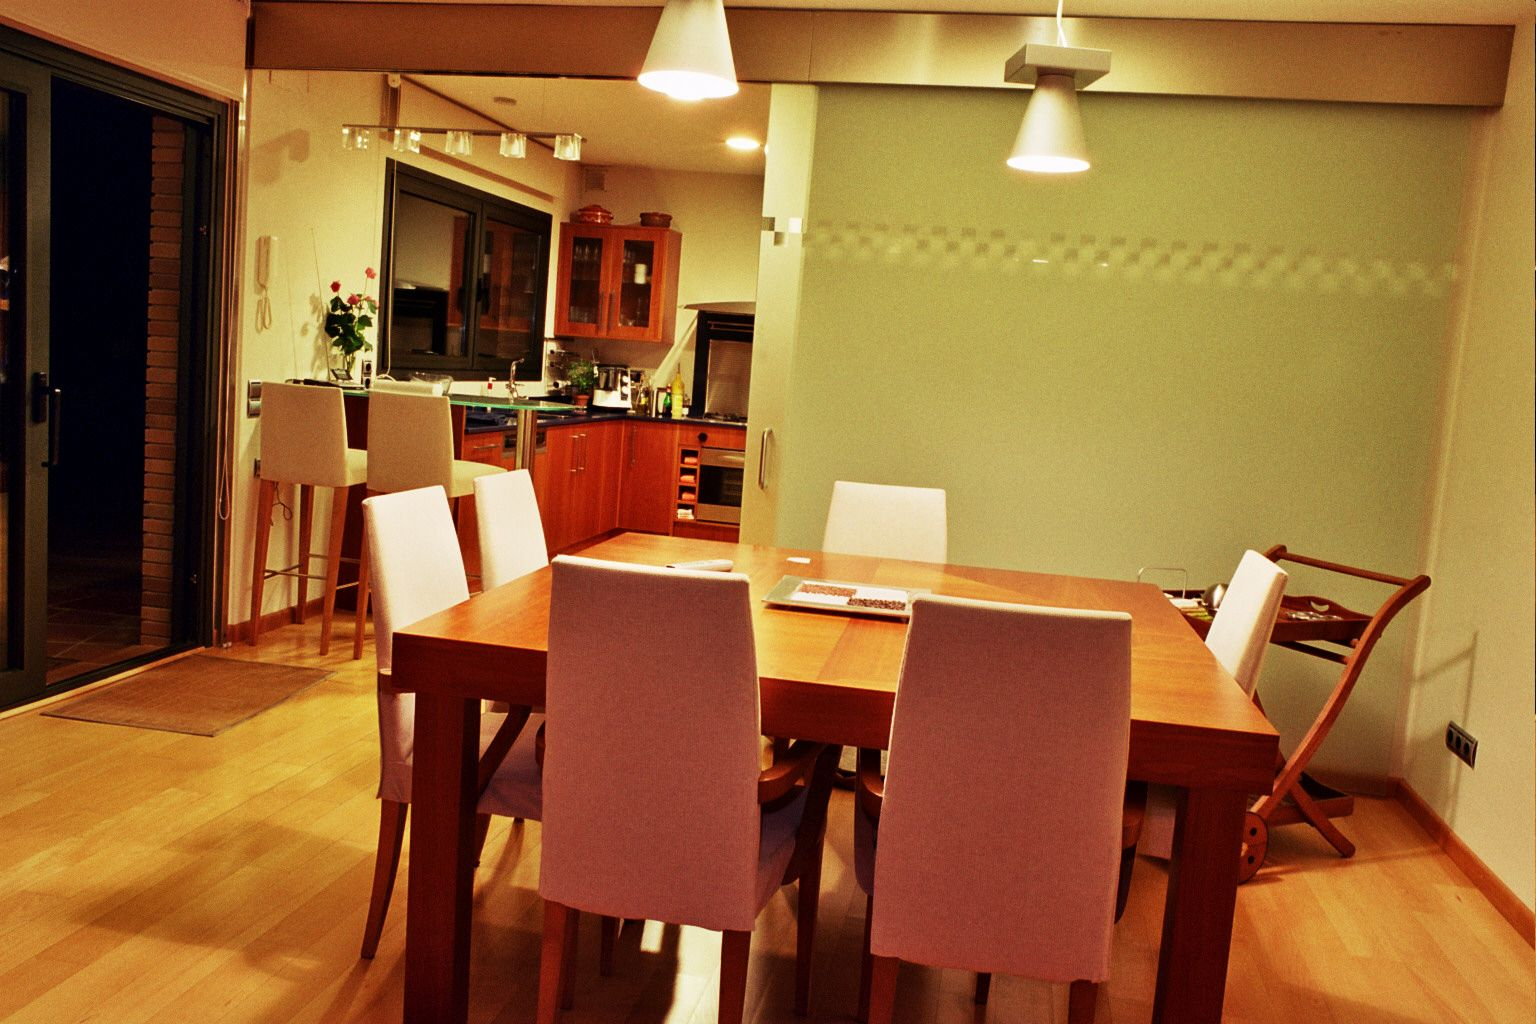 Decoracion moderno comedor sillas mesas de comedor - Kibuc mesas comedor ...